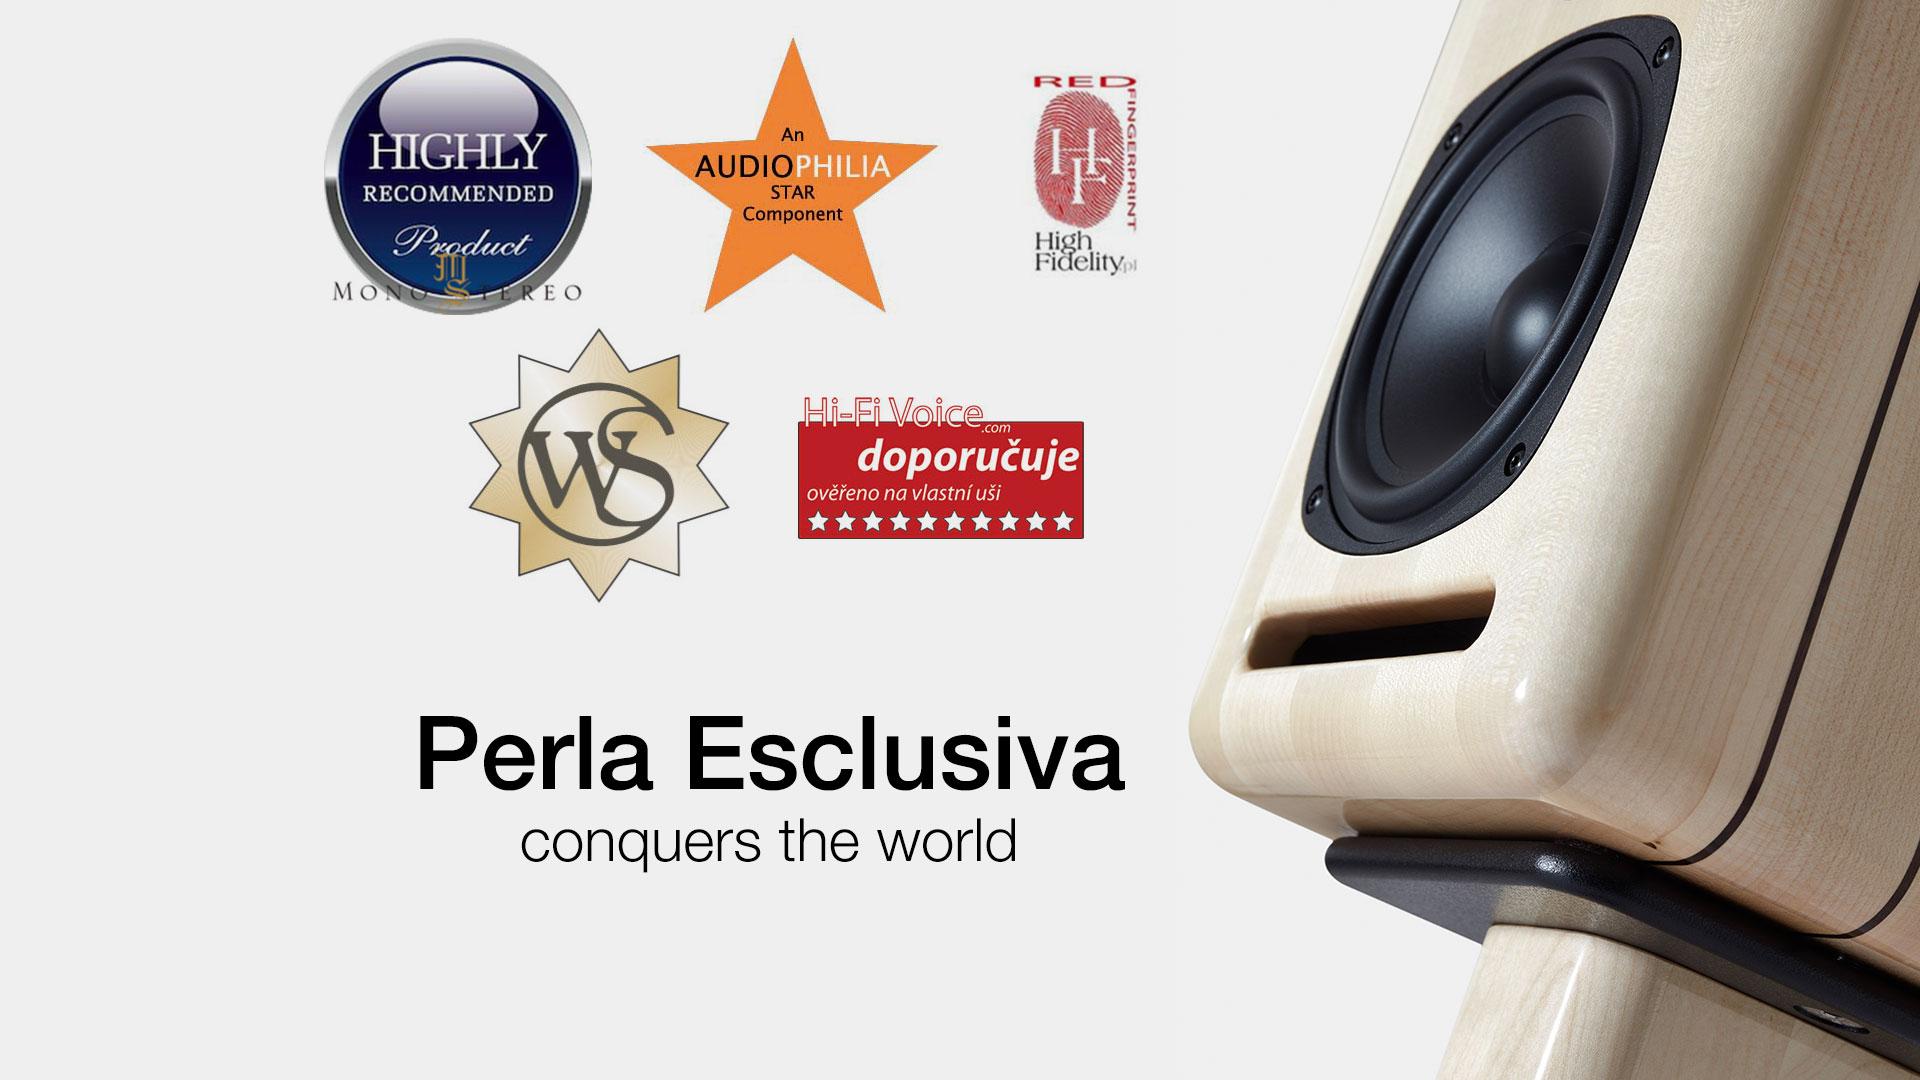 perla-esclusiva-awards